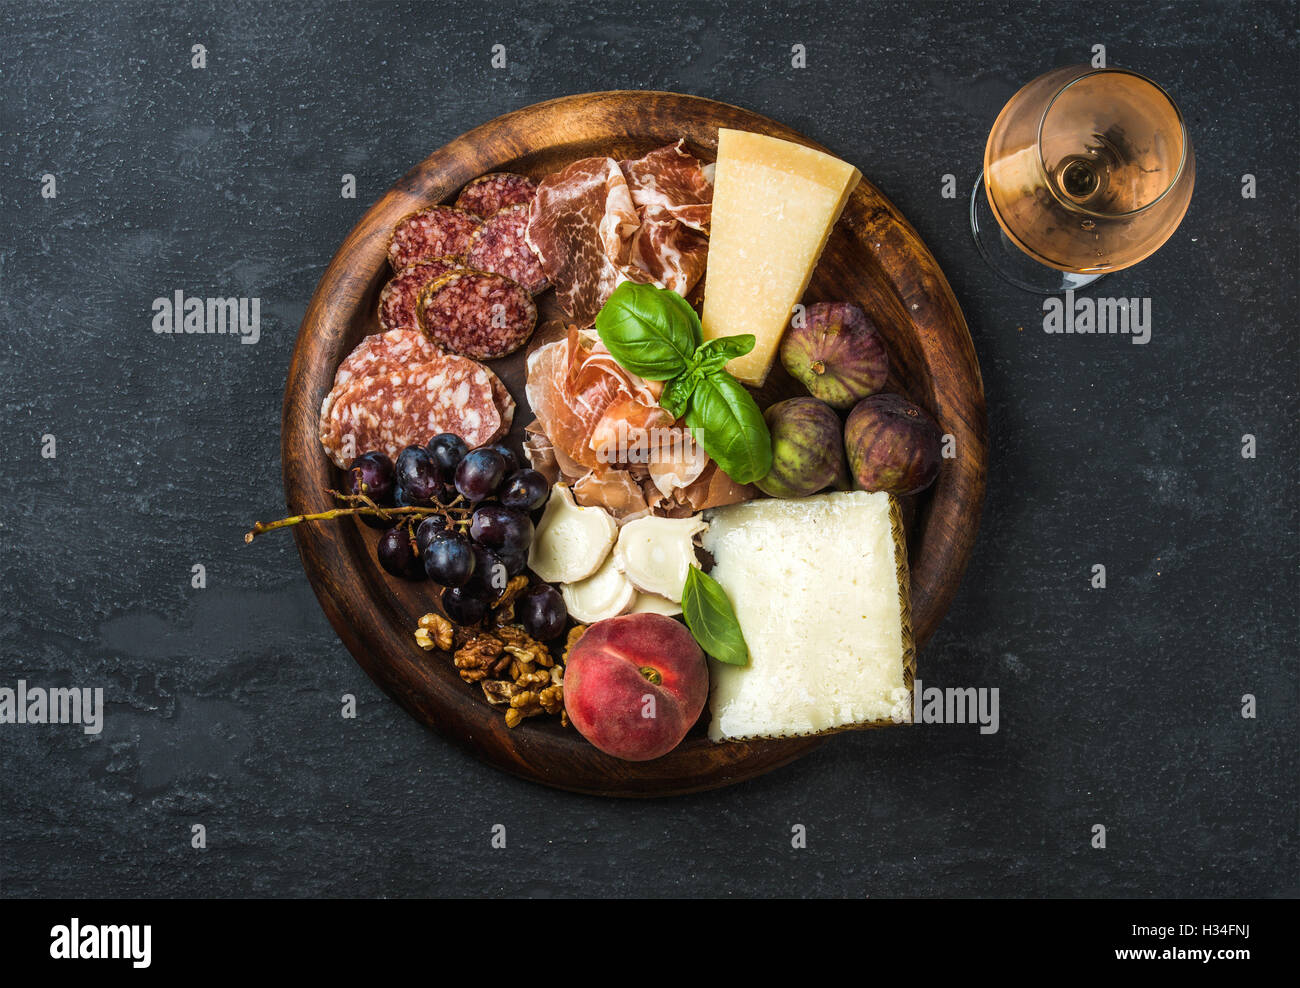 Italian antipasti snacks and glass of rose wine - Stock Image